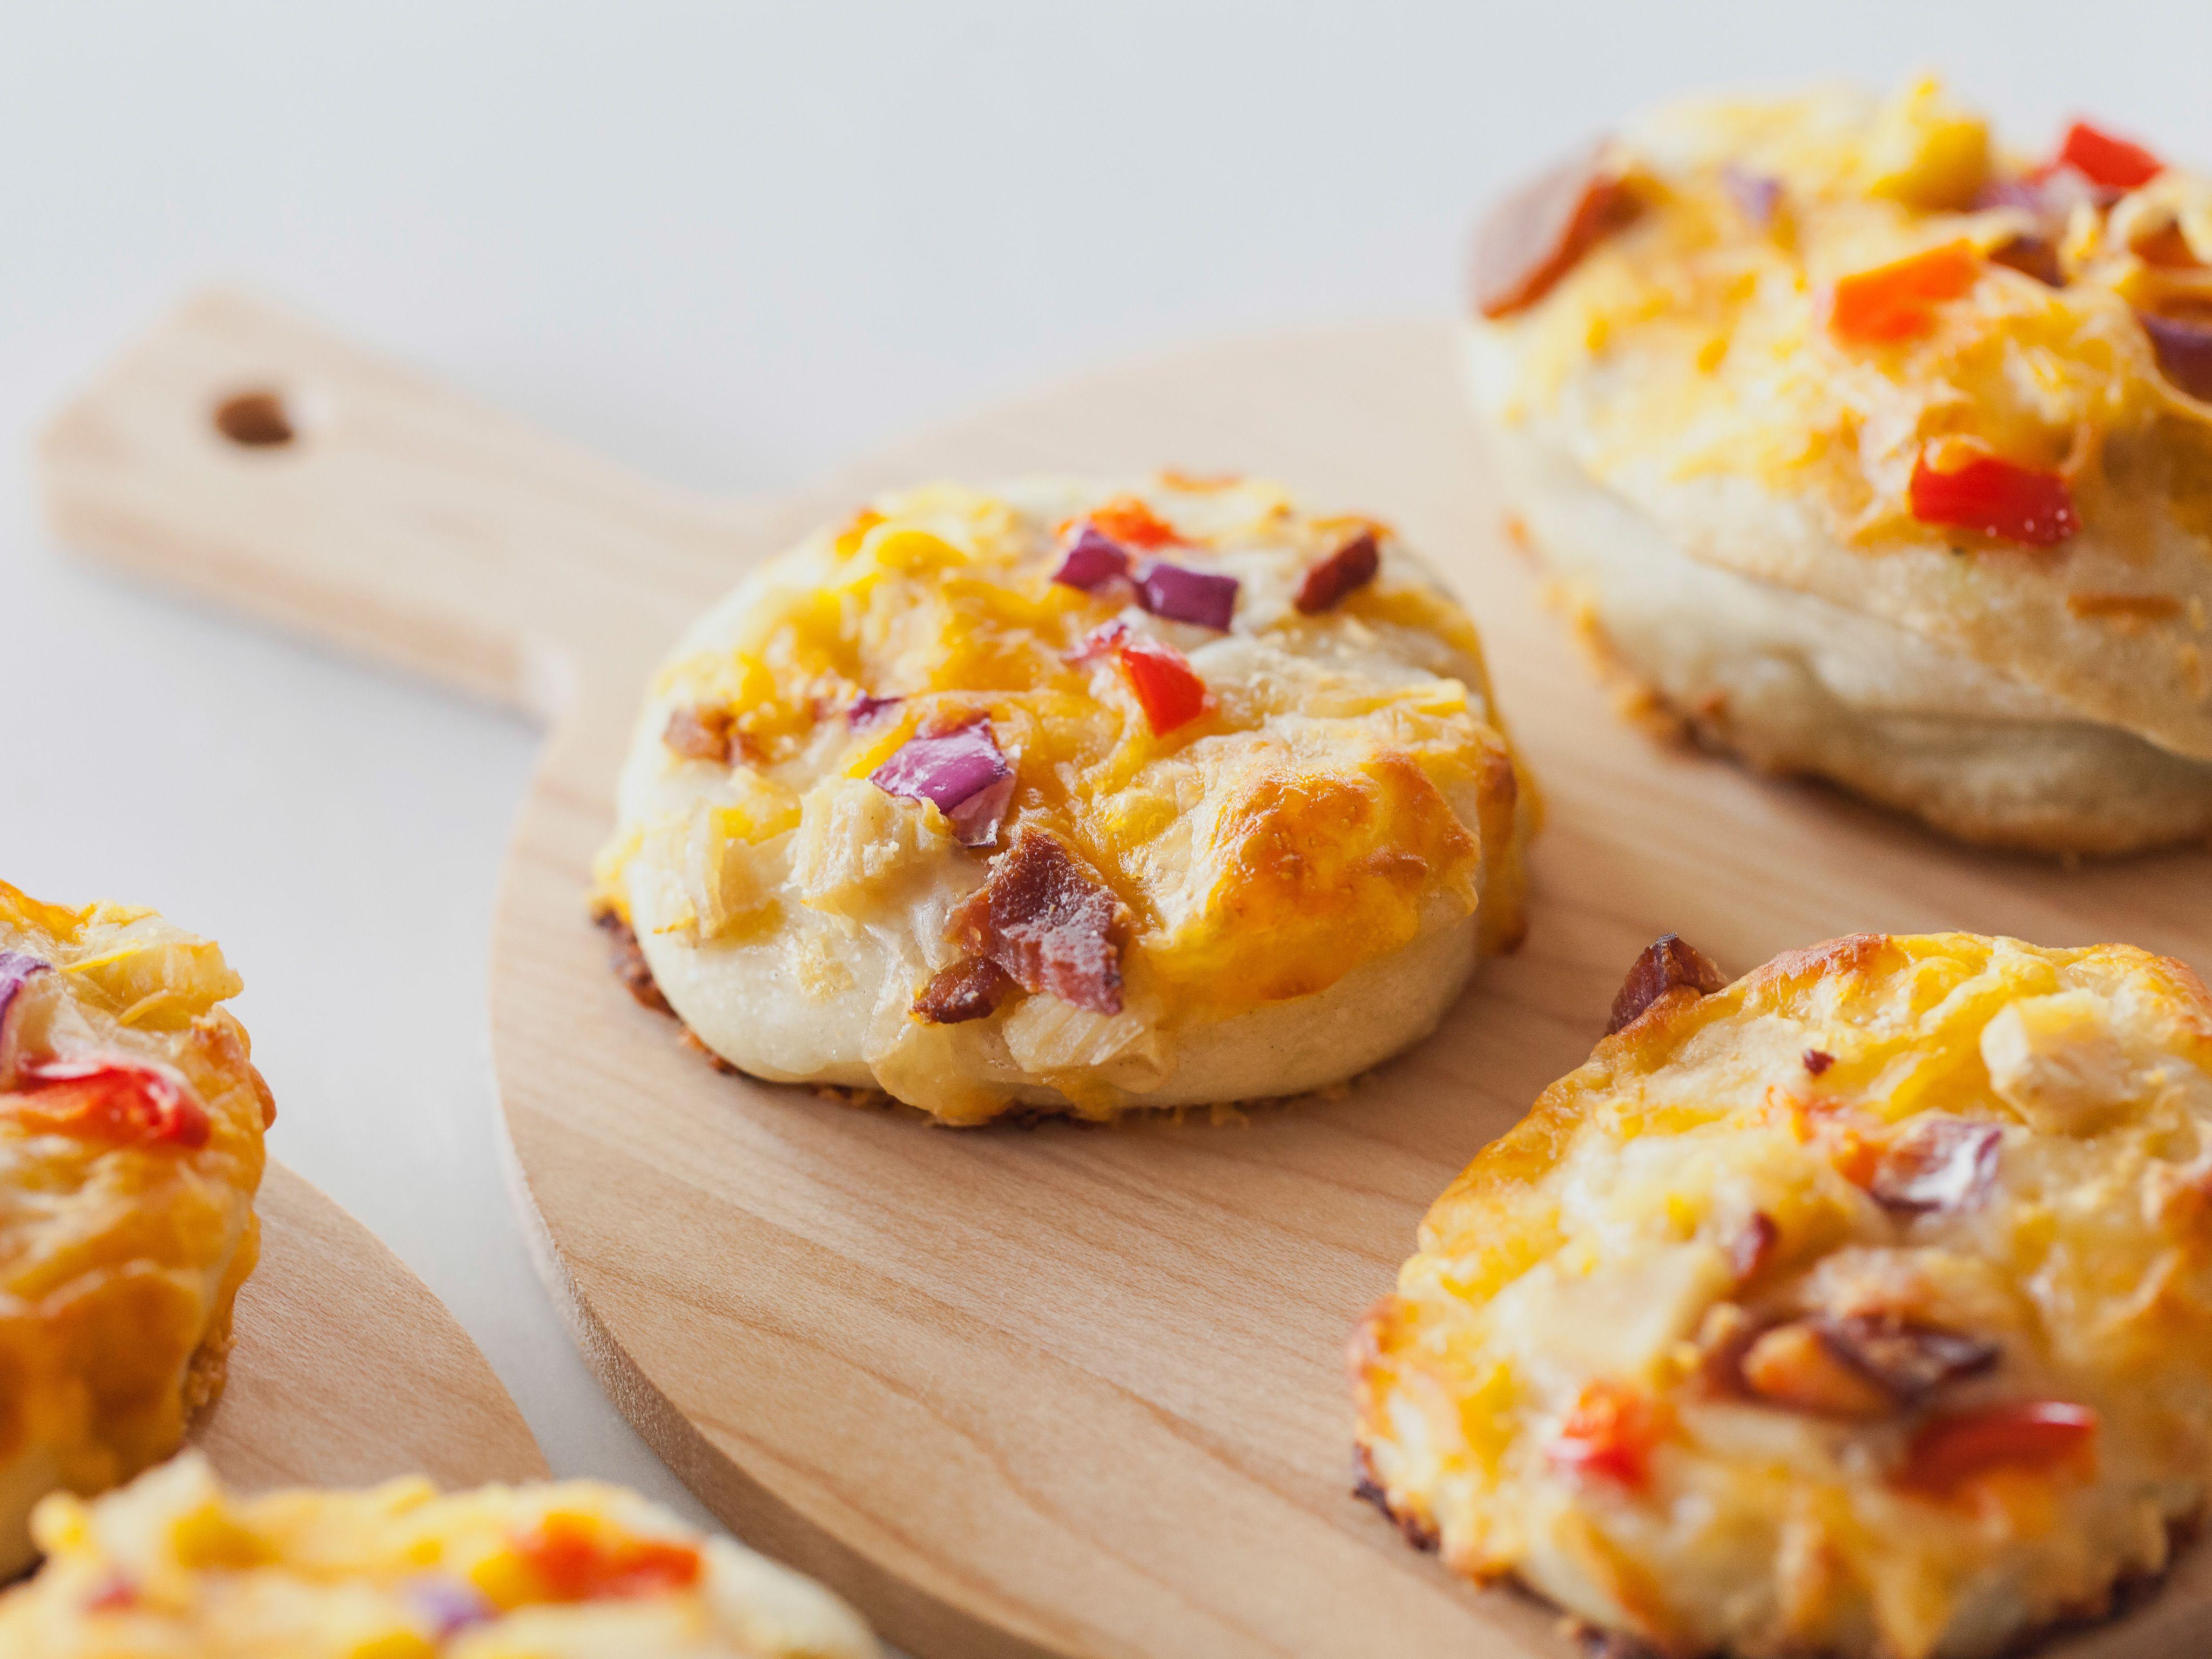 Mini chicken pizzas recipe trisha yearwood chicken pizza and main dishes mini chicken pizzas recipe trisha yearwood food network forumfinder Image collections